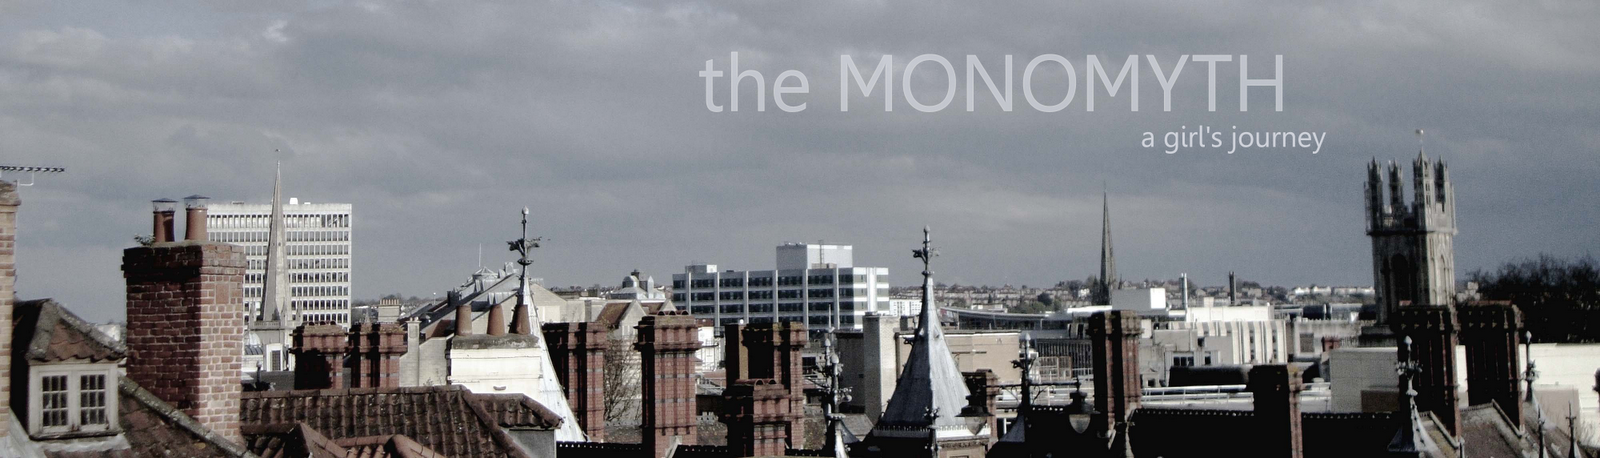 The Monomyth